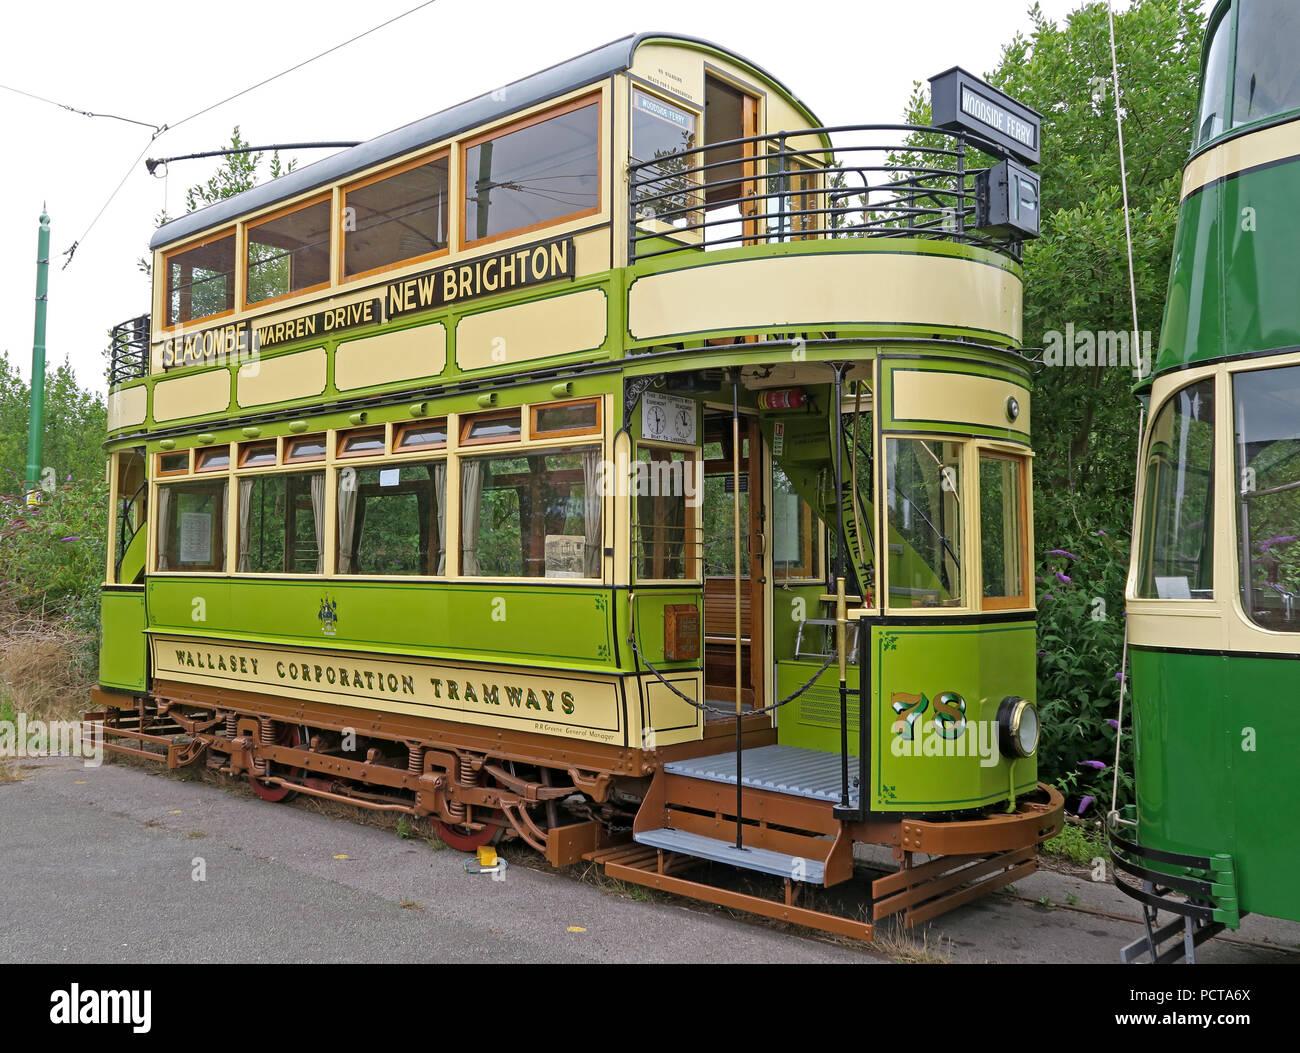 GoTonySmith,@HotpixUK,Transport,tram,trams,Birkenhead,green,cream,creme,north west England,UK,England,public,public trams,public tram,history,historic,electric